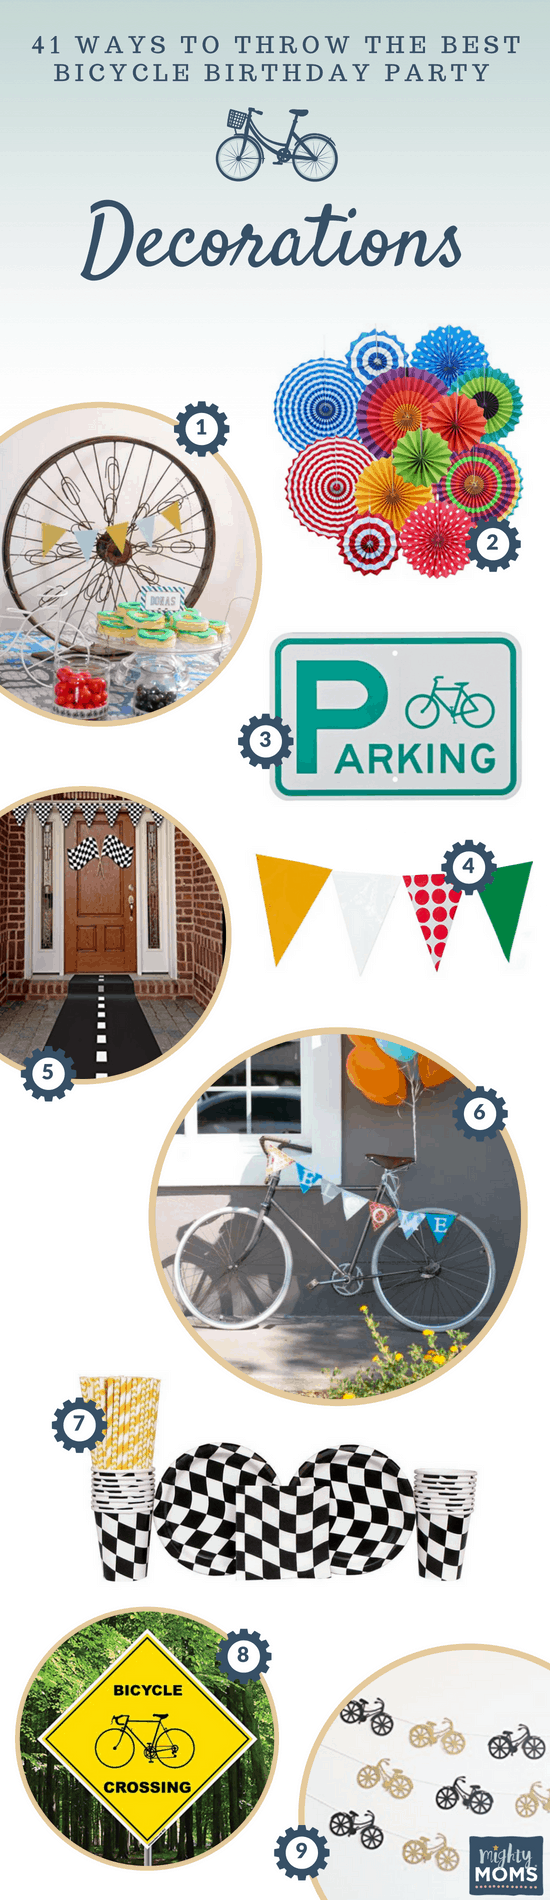 Bicycle Birthday Party Decor Ideas - MightyMoms.club